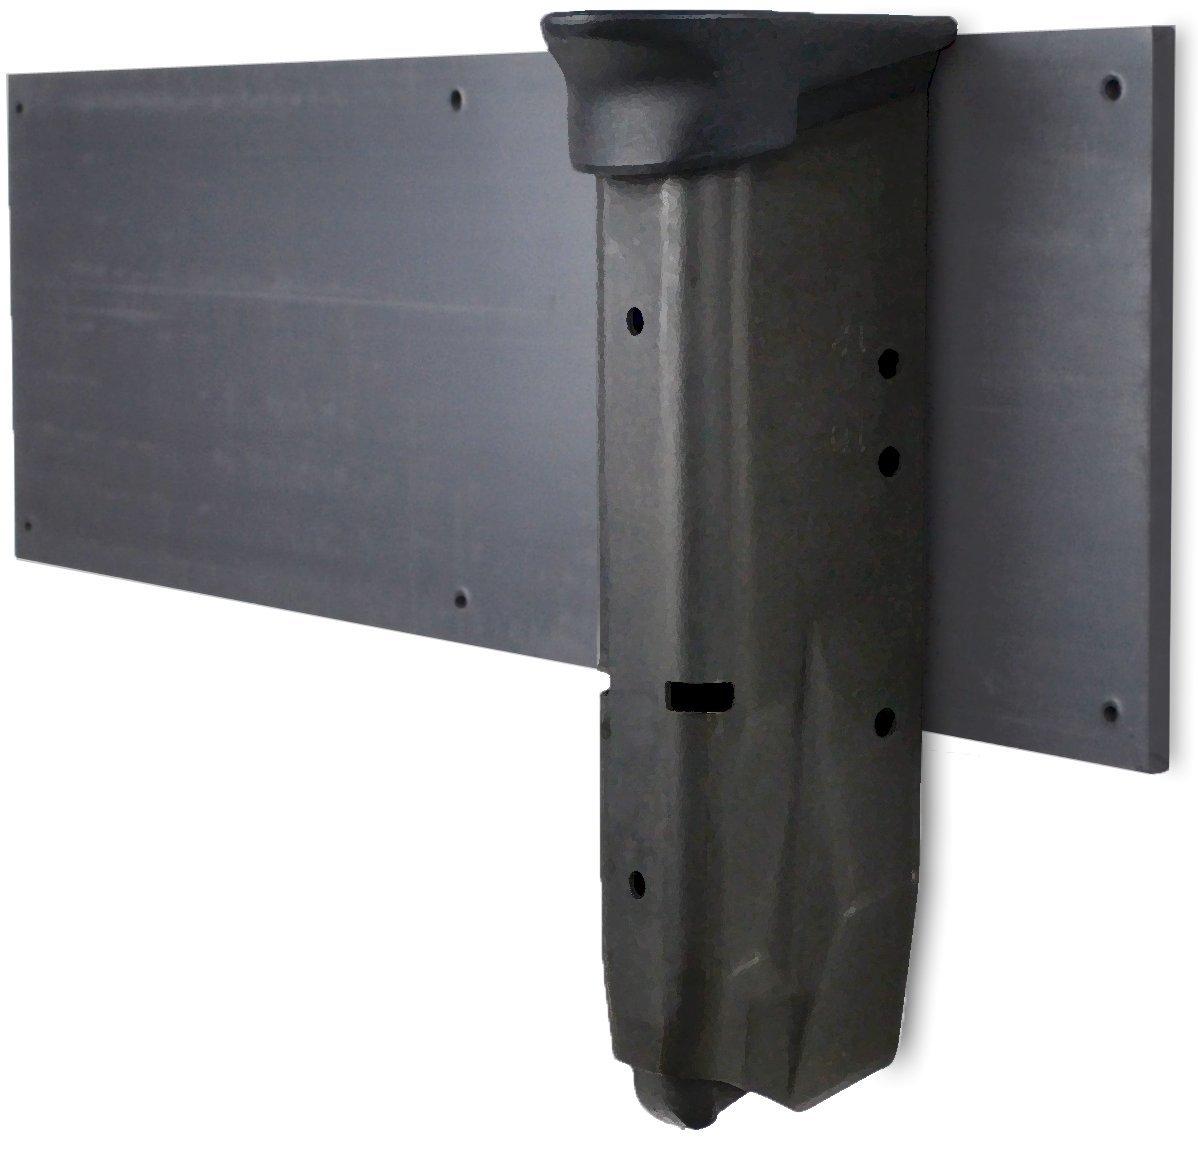 Gun Storage Solutions Magazine Mount A.C. Kerman - LE GSMGMT